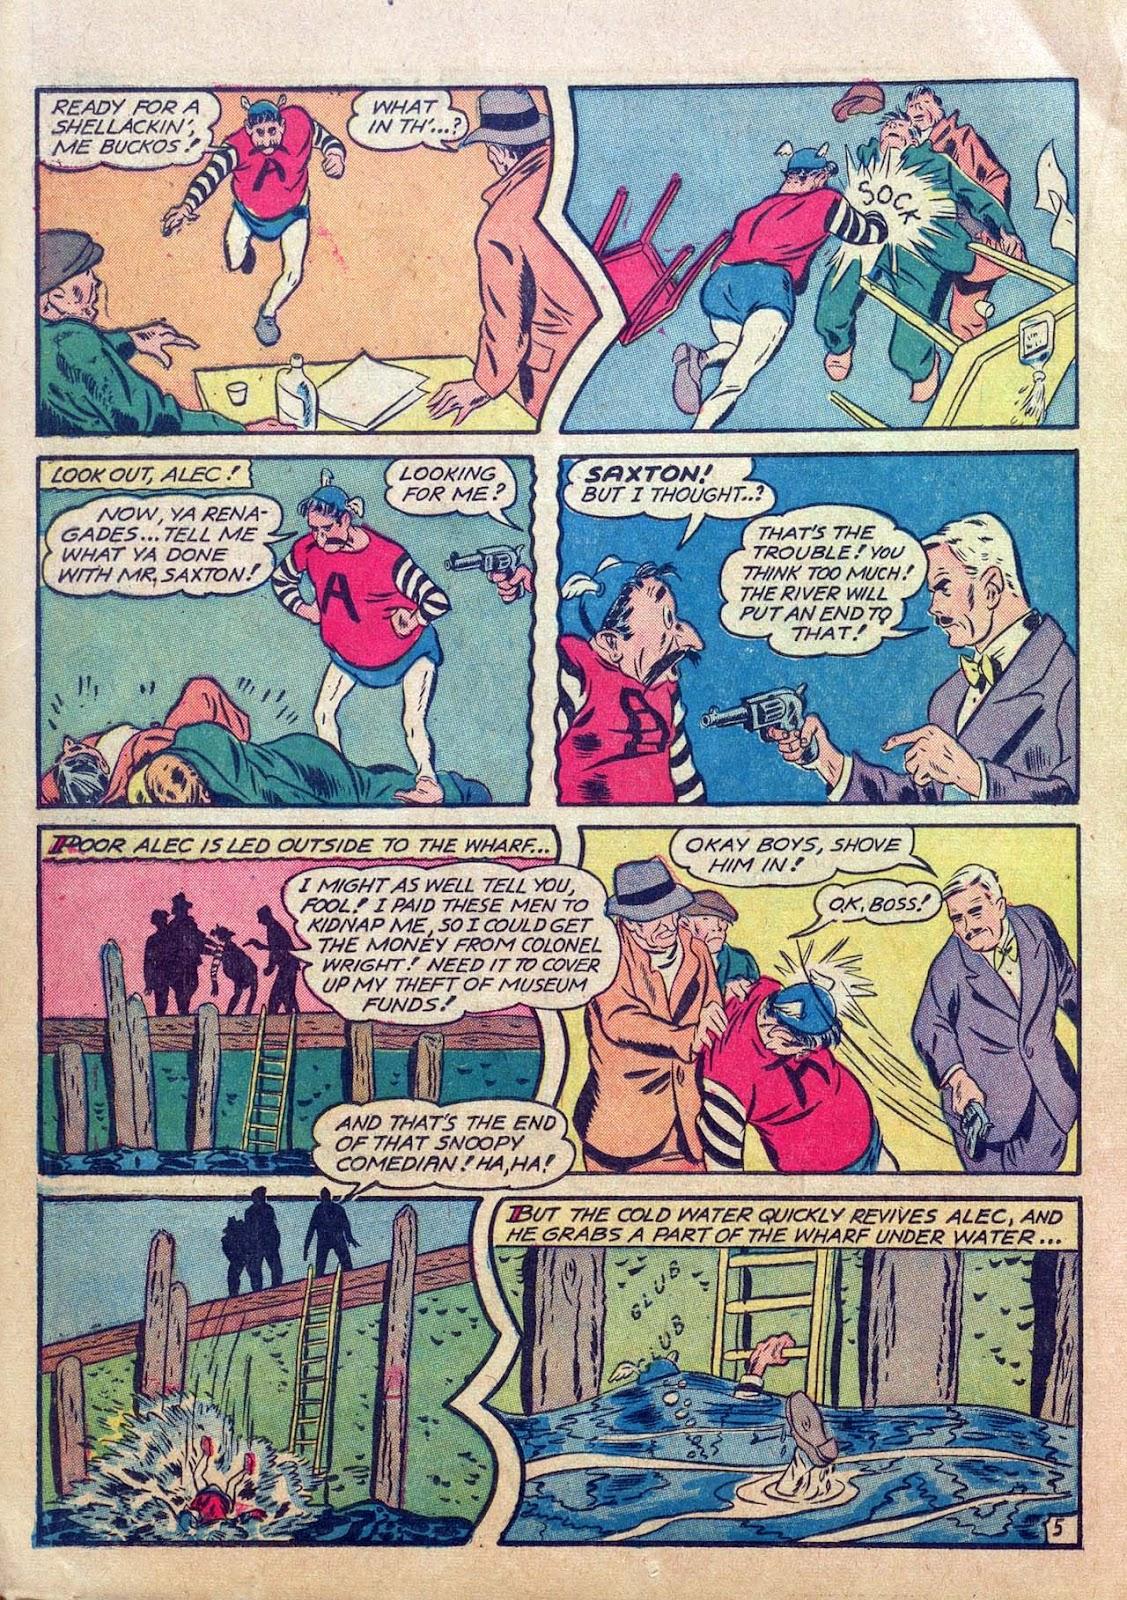 Read online Joker Comics comic -  Issue #1 - 40